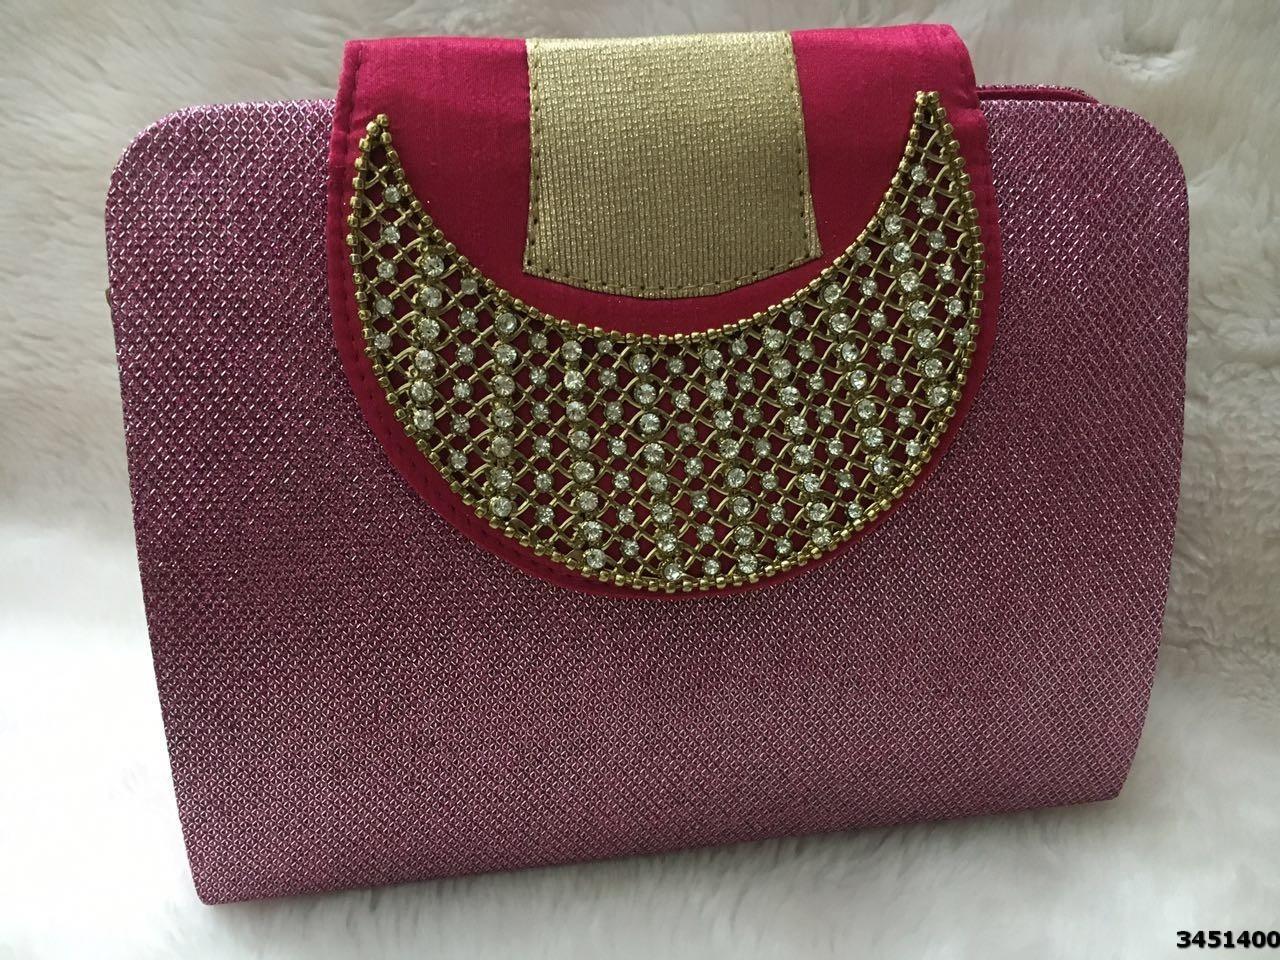 Eye Catching Ethnic Stylish Evening Clutch Bag